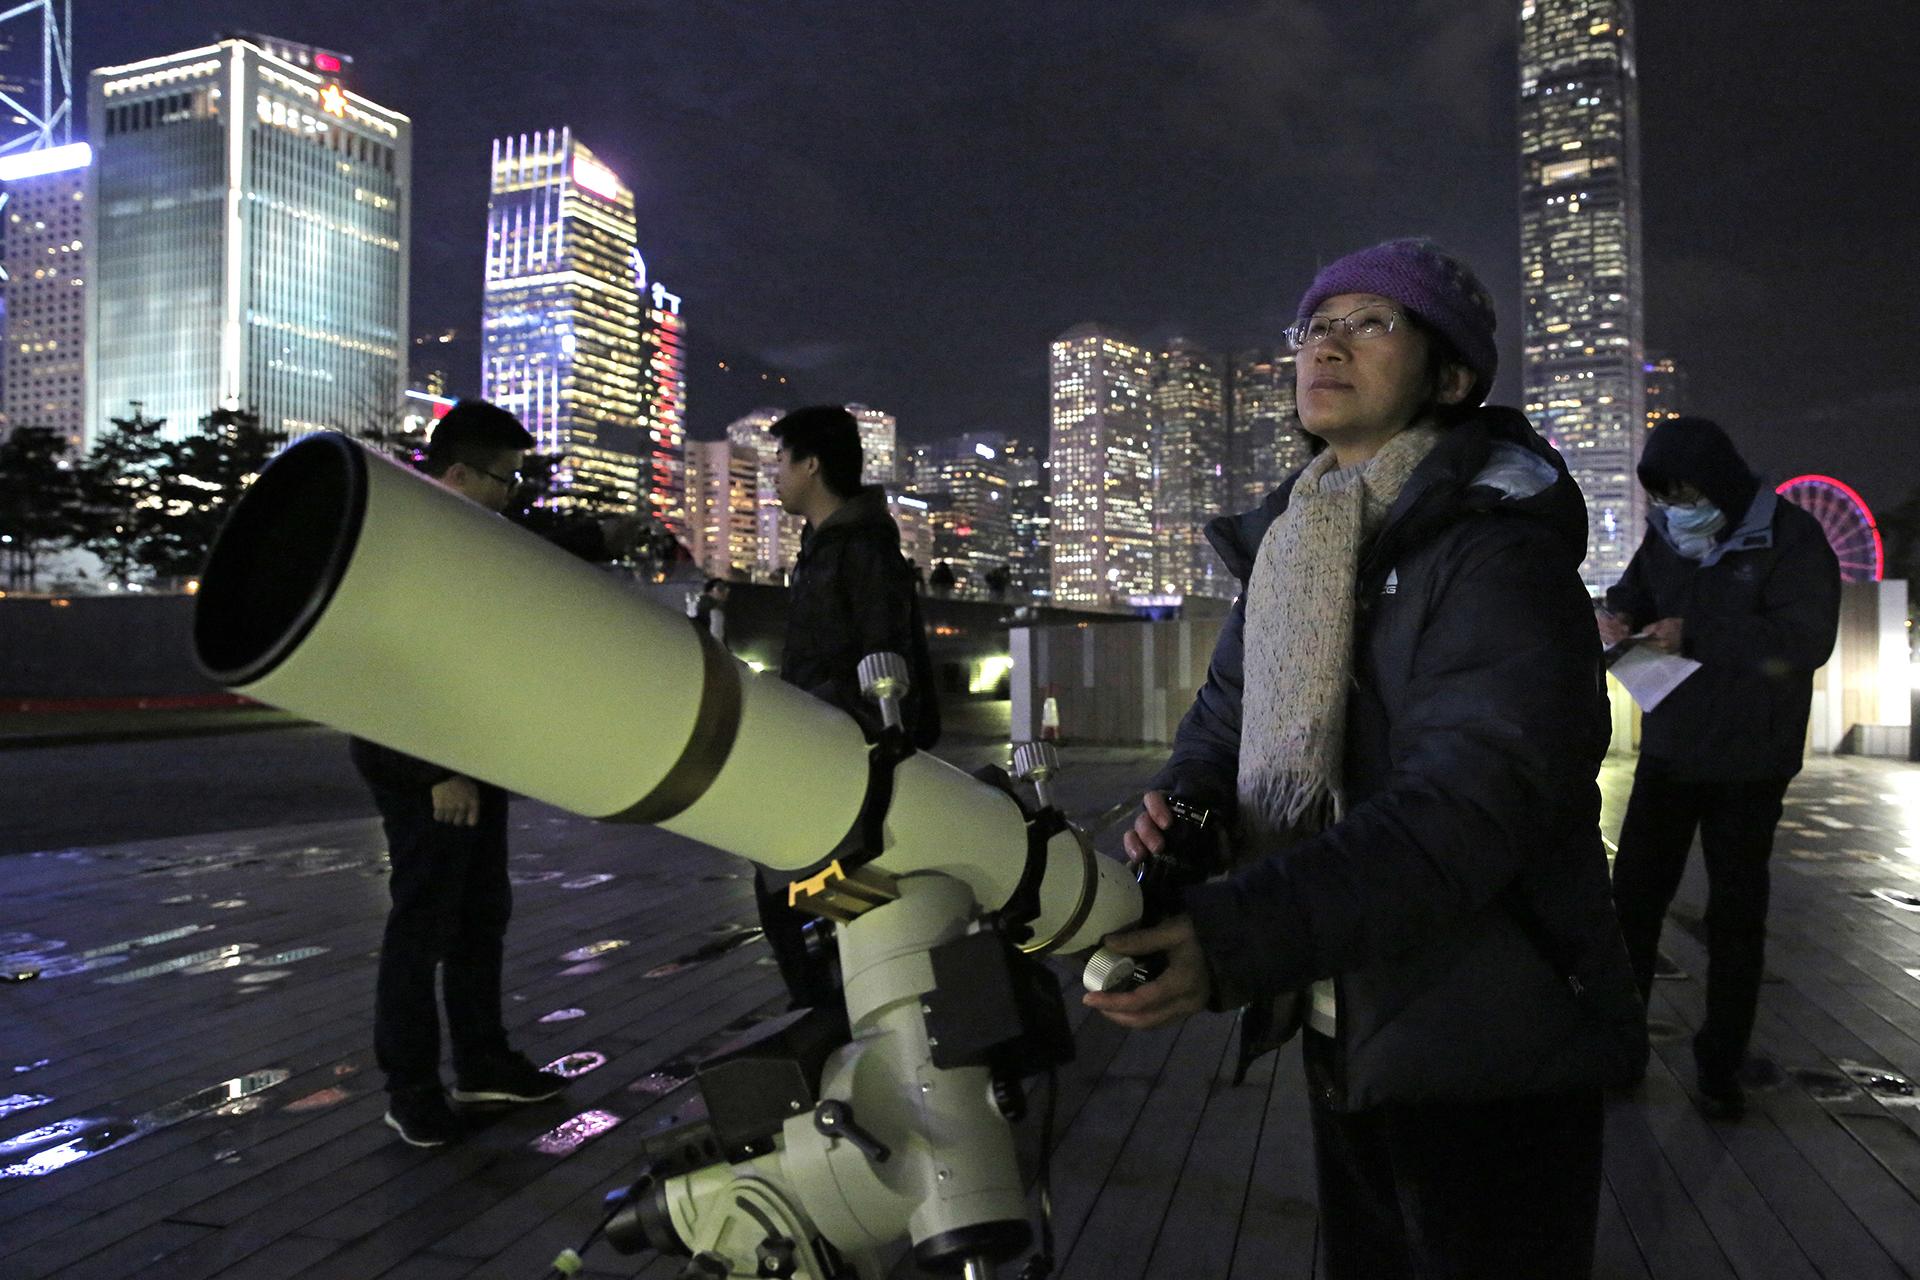 Un astrónomo de Hong Kong utiliza un telescopio para observar la luna a lo largo del Victoria Harbour en Hong Kong, el miércoles 31 de enero de 2018 (AP)